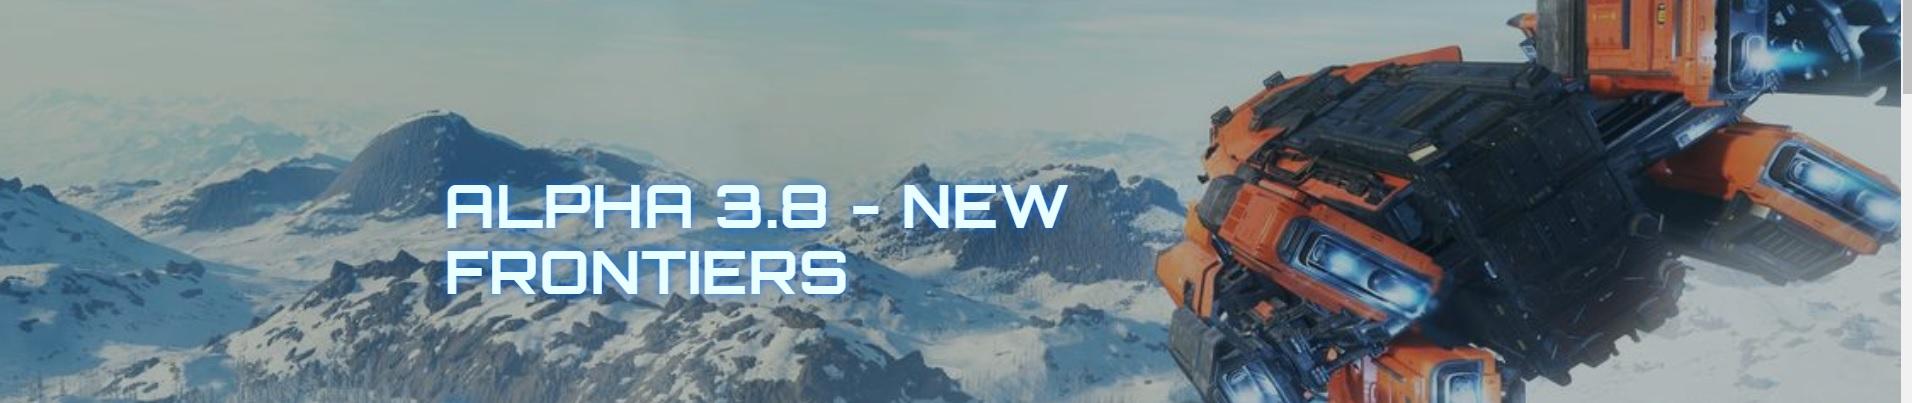 [Release 3.8 Alpha] Вышла новая версия Star Citizen